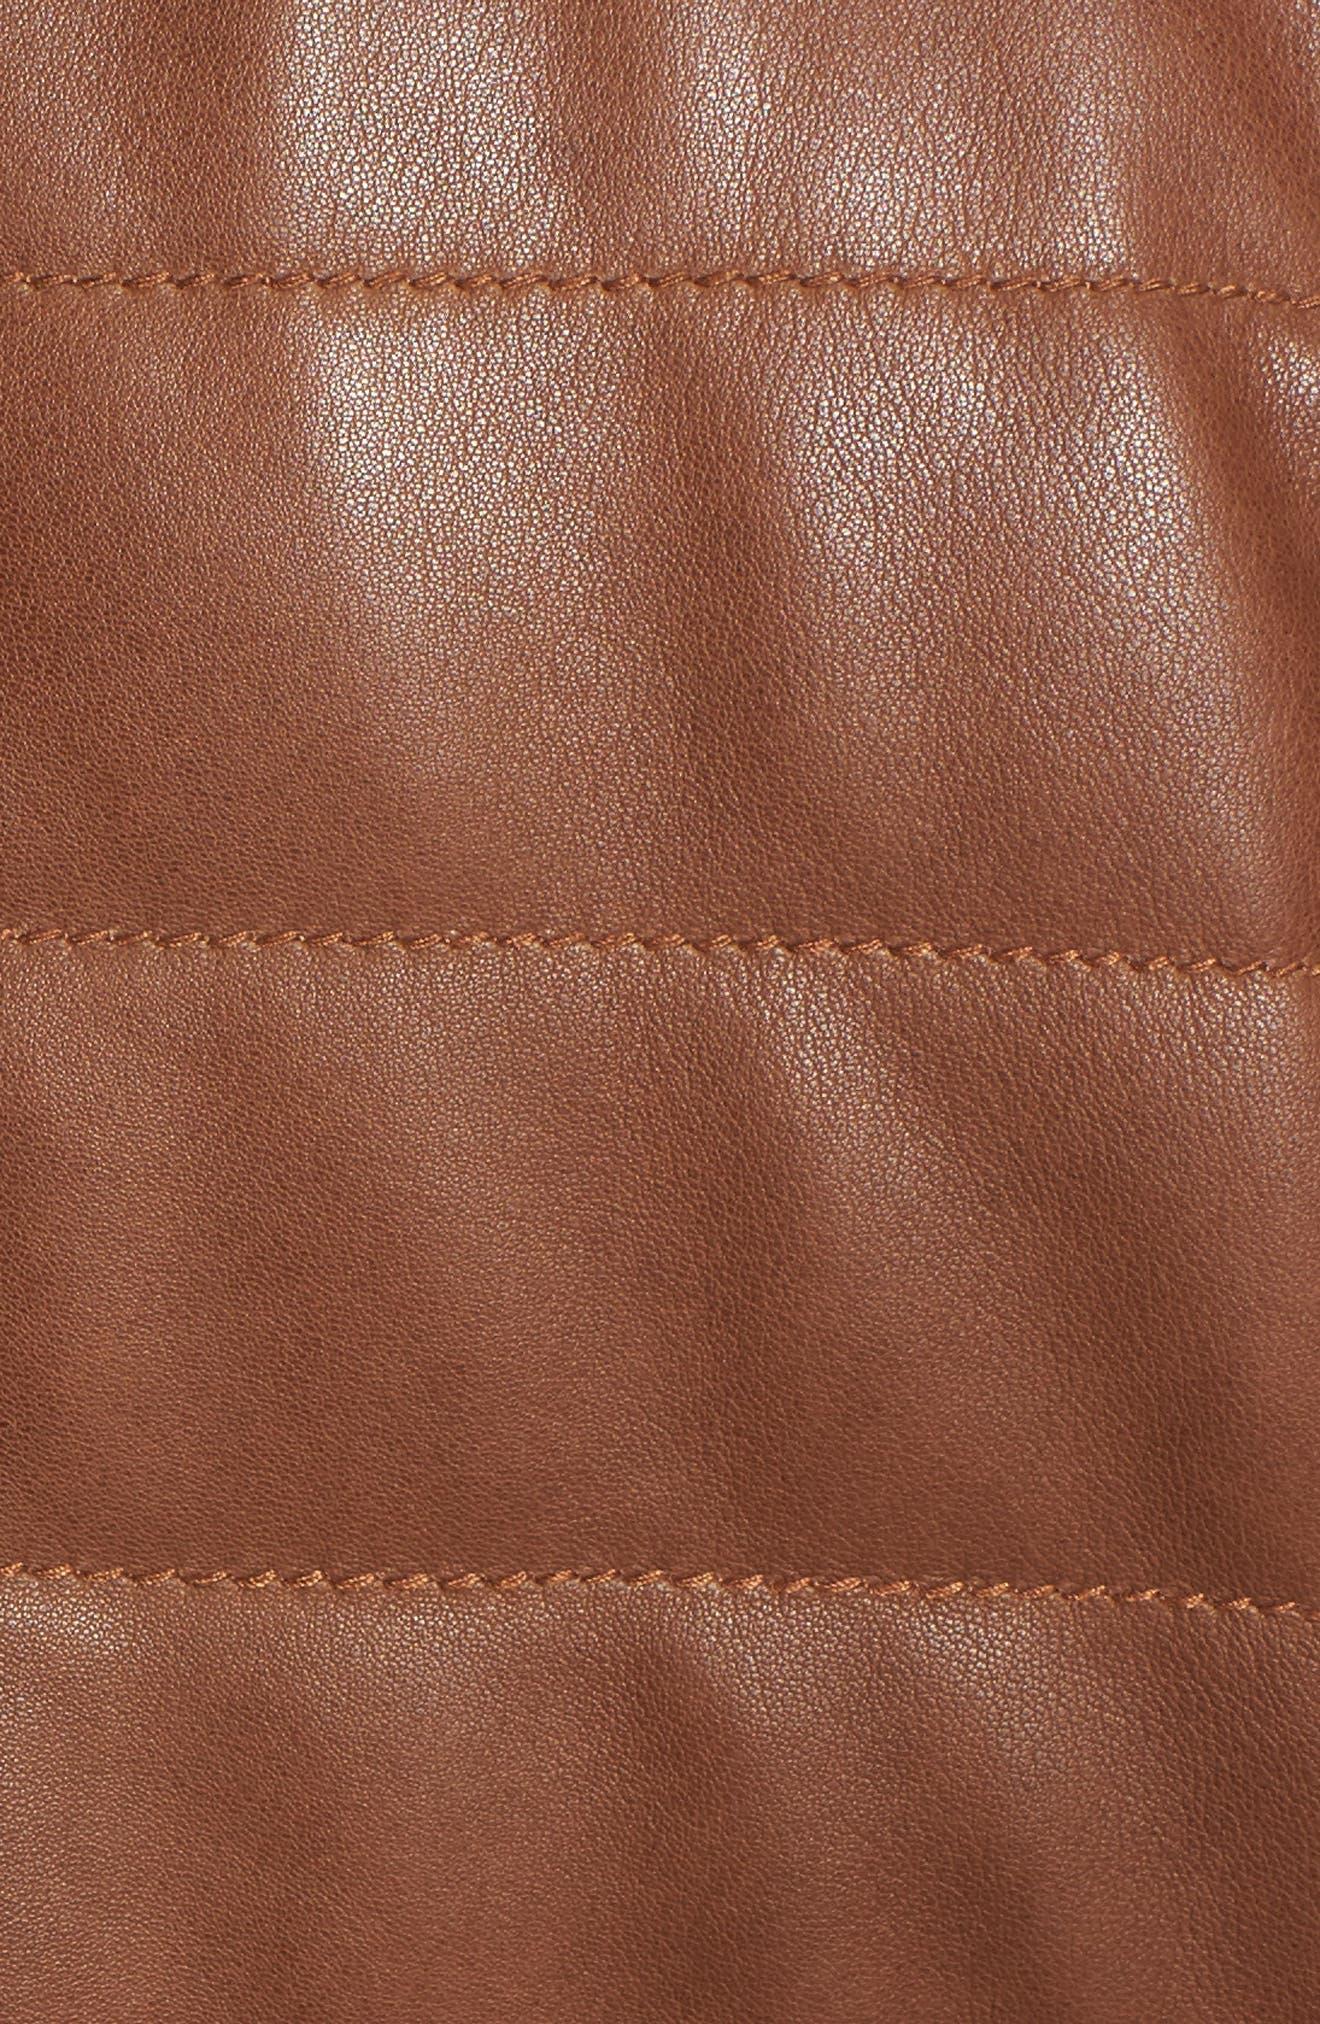 Snowside Leather Bomber Jacket,                             Alternate thumbnail 6, color,                             200